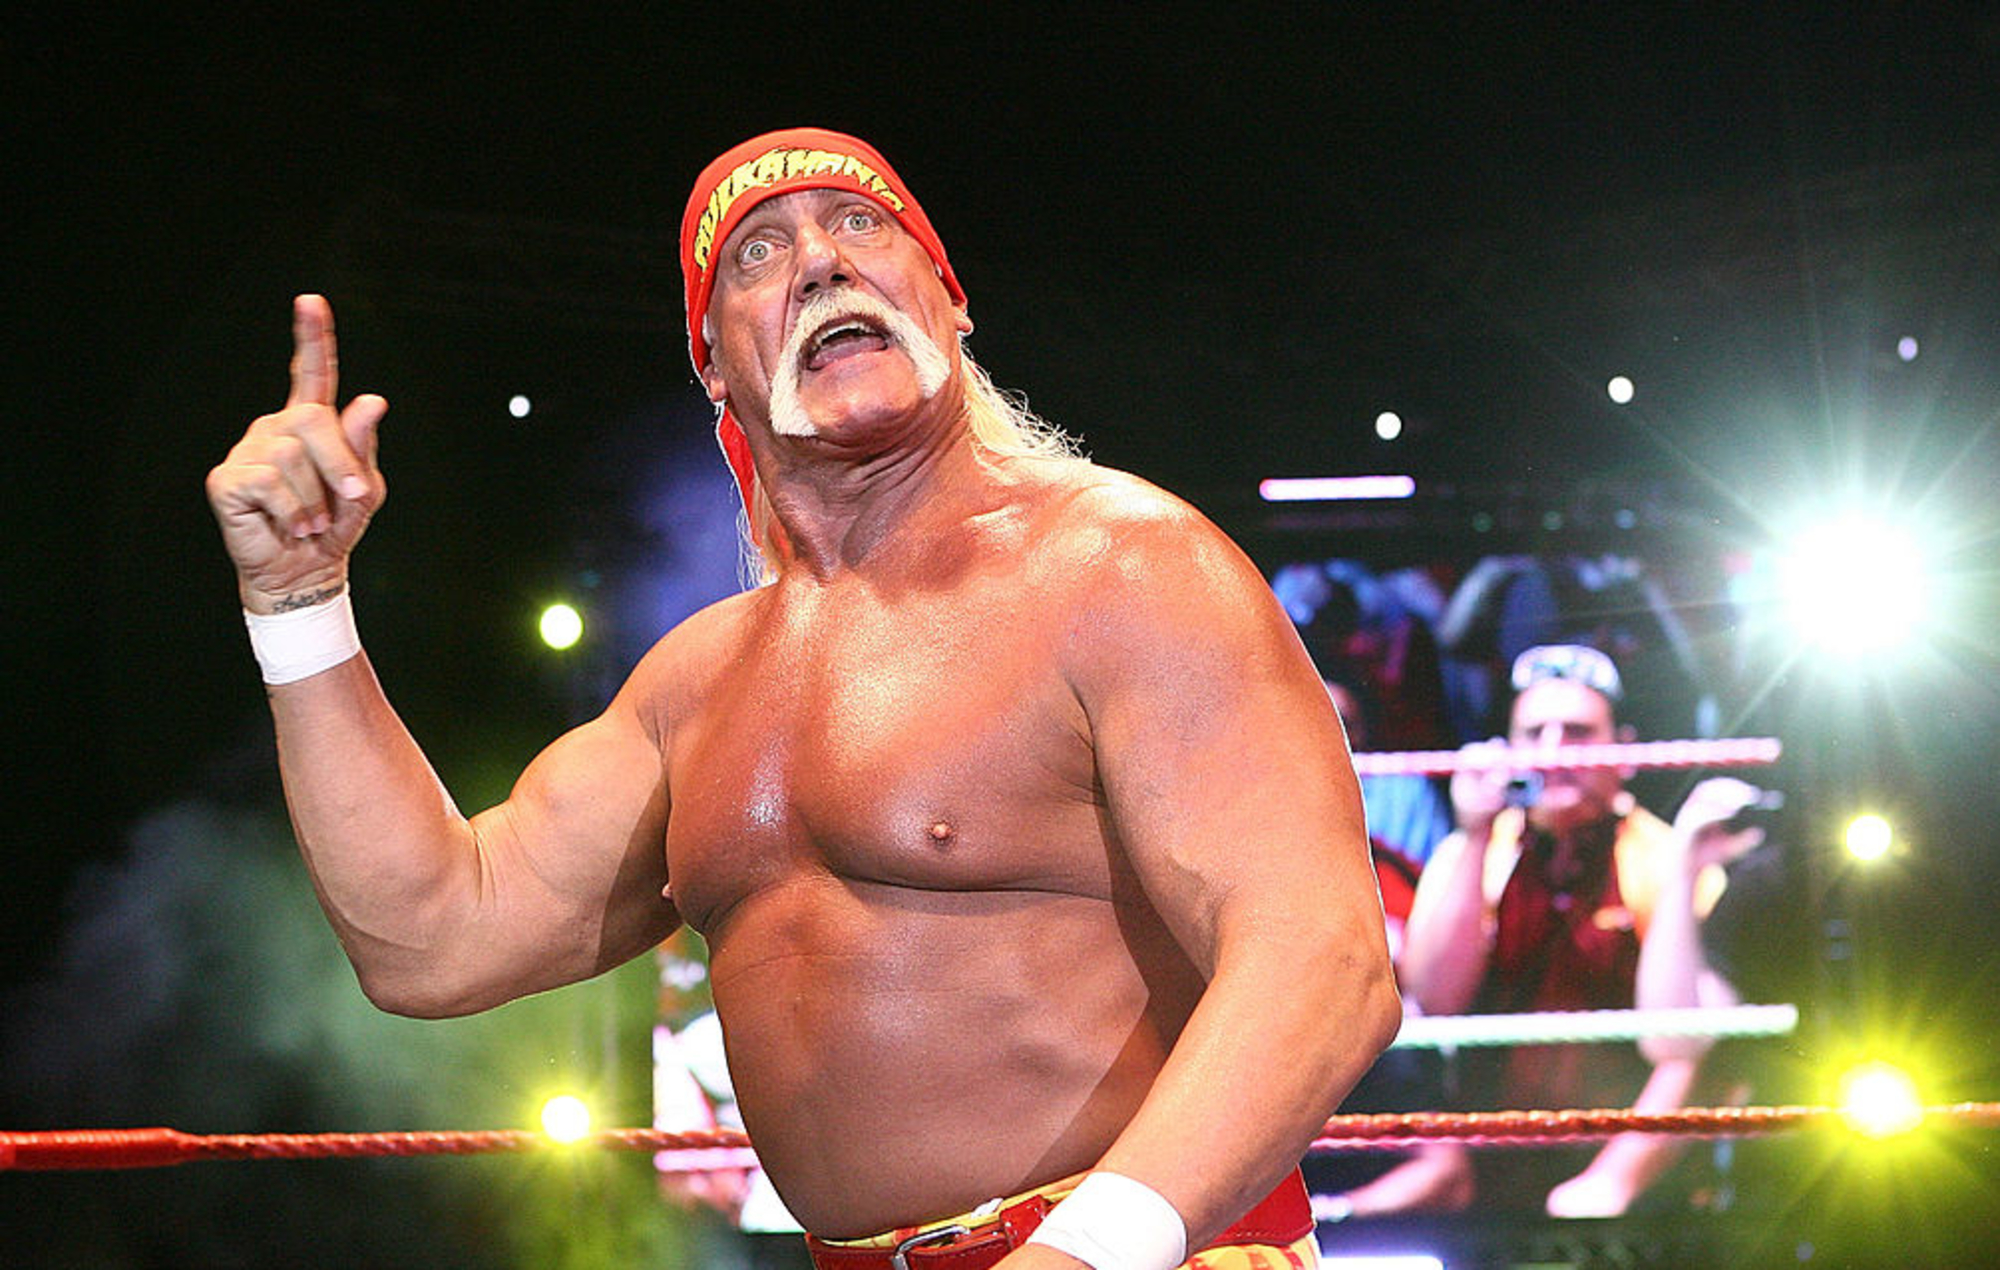 Hulk Hoogan